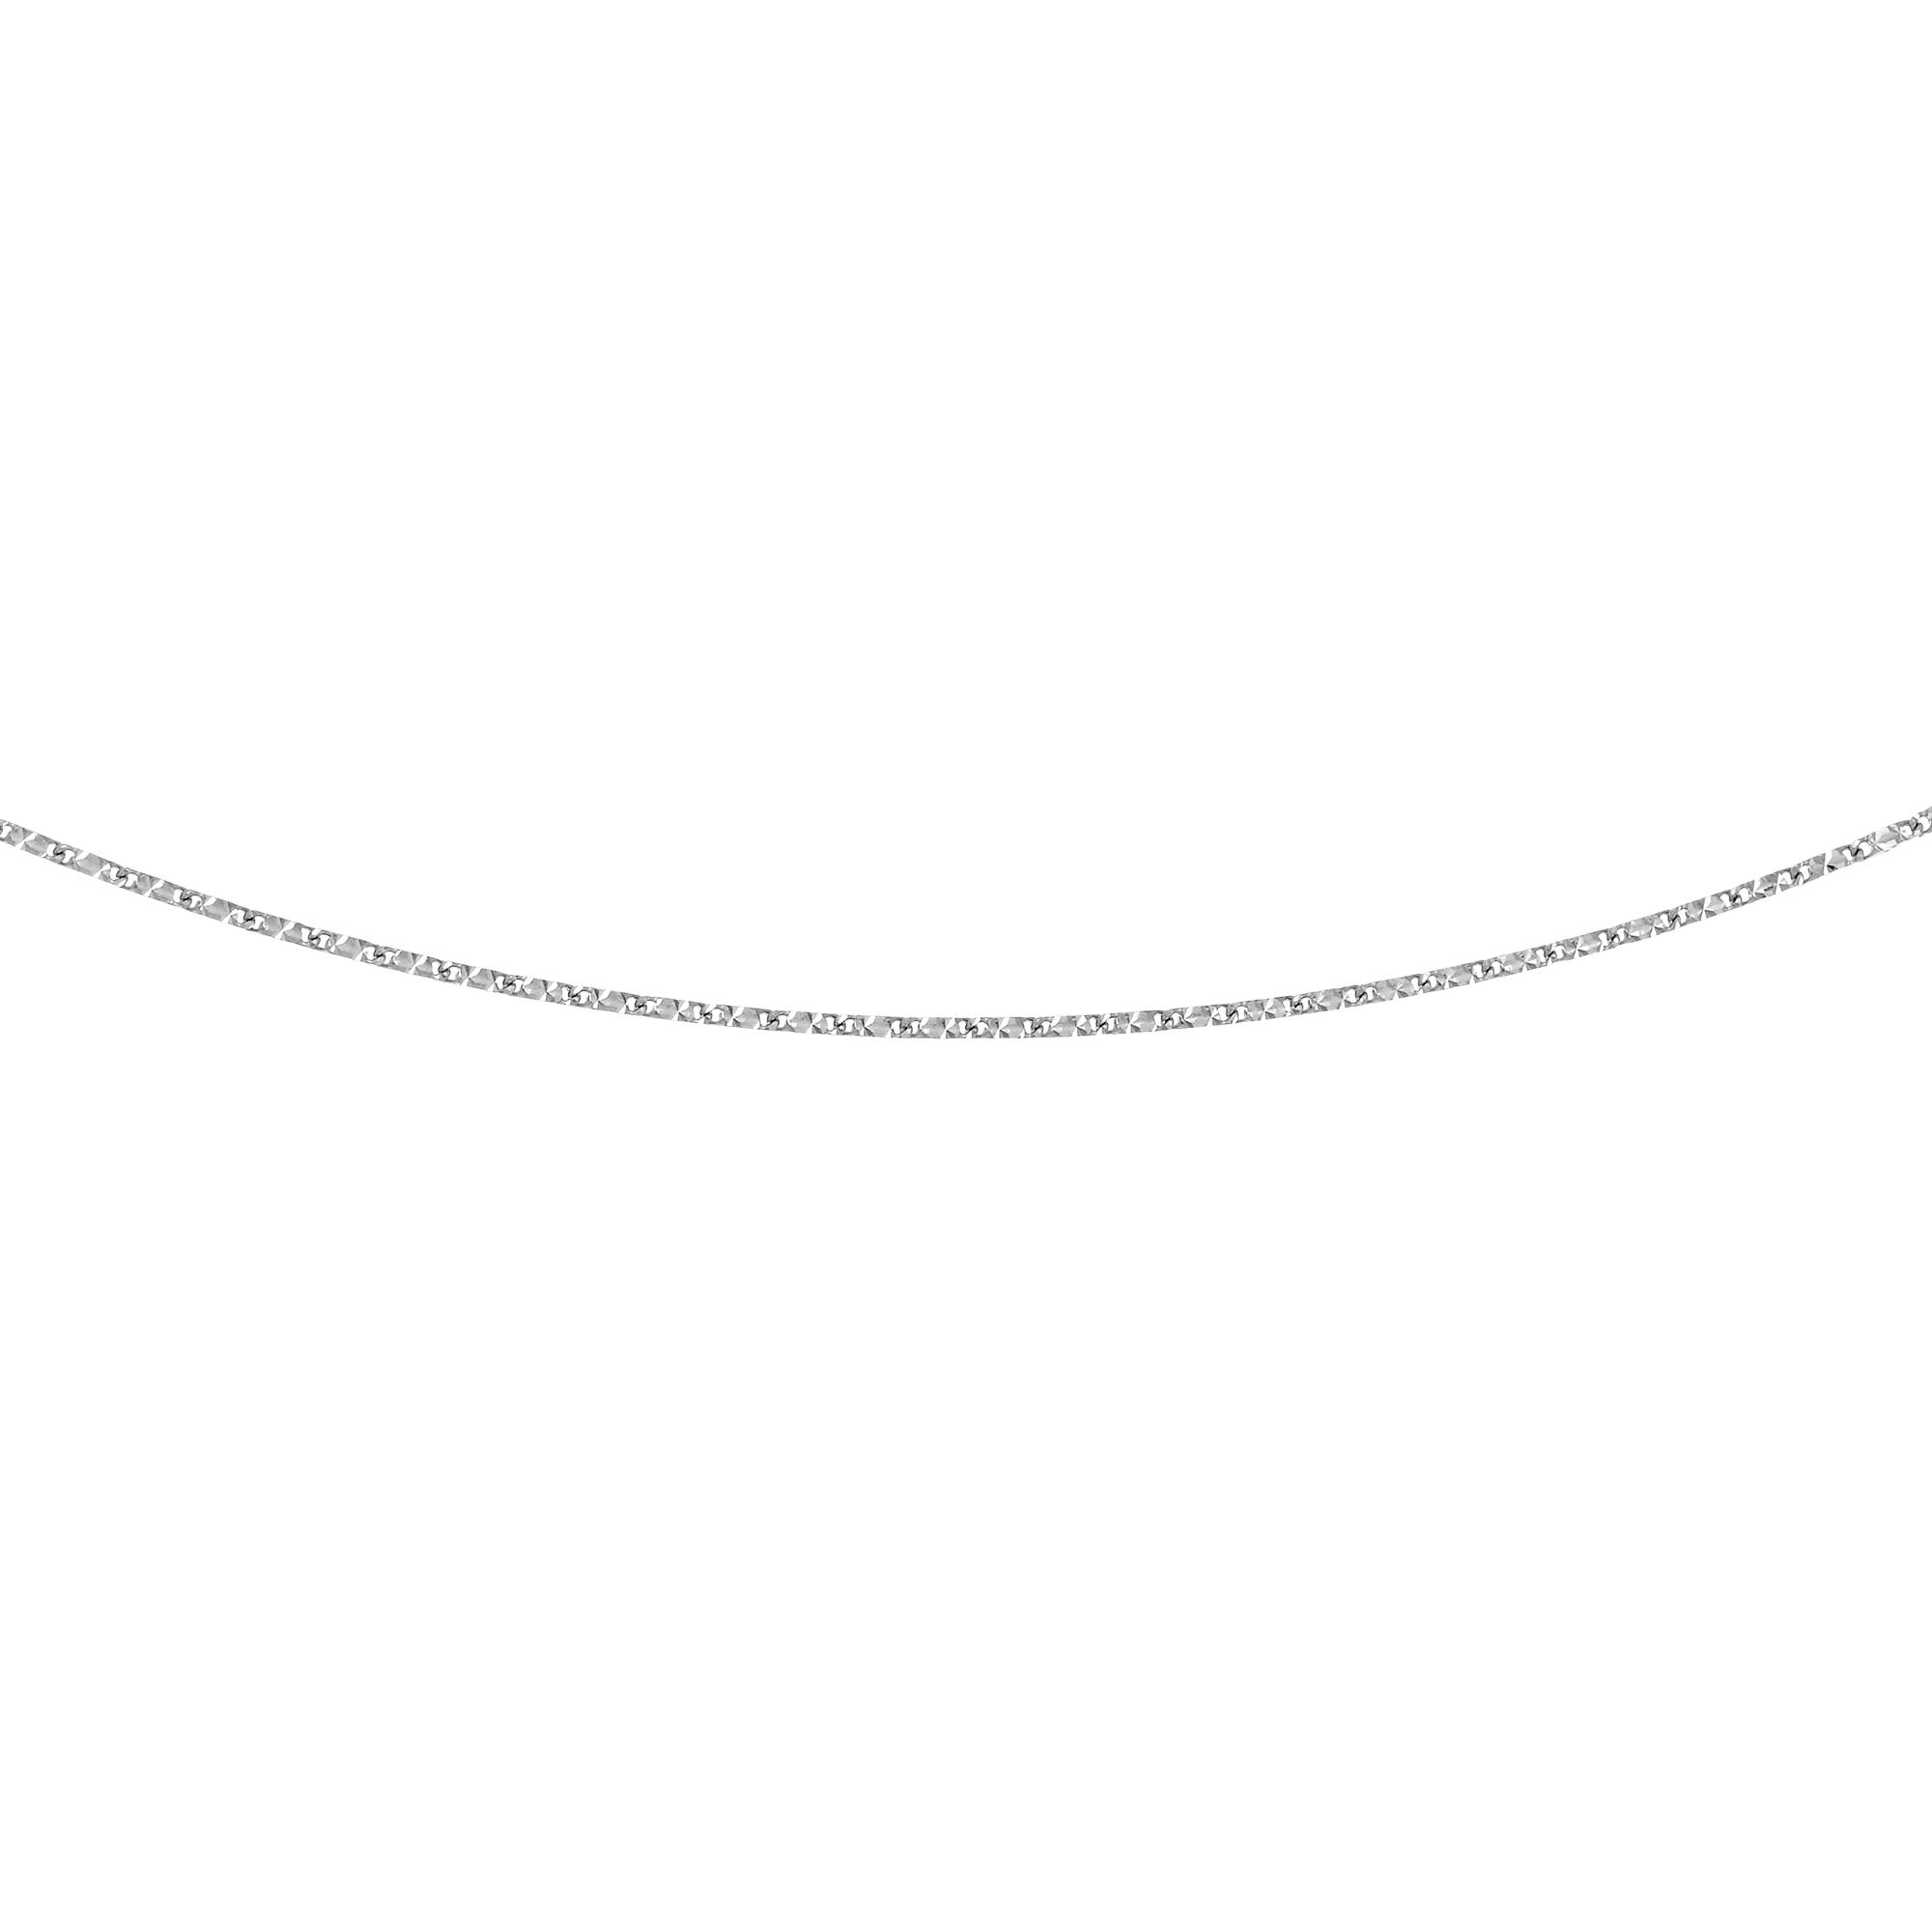 LUXURMAN Solid 14k Gold Raindrop Chain For Women 0.8mm Wide